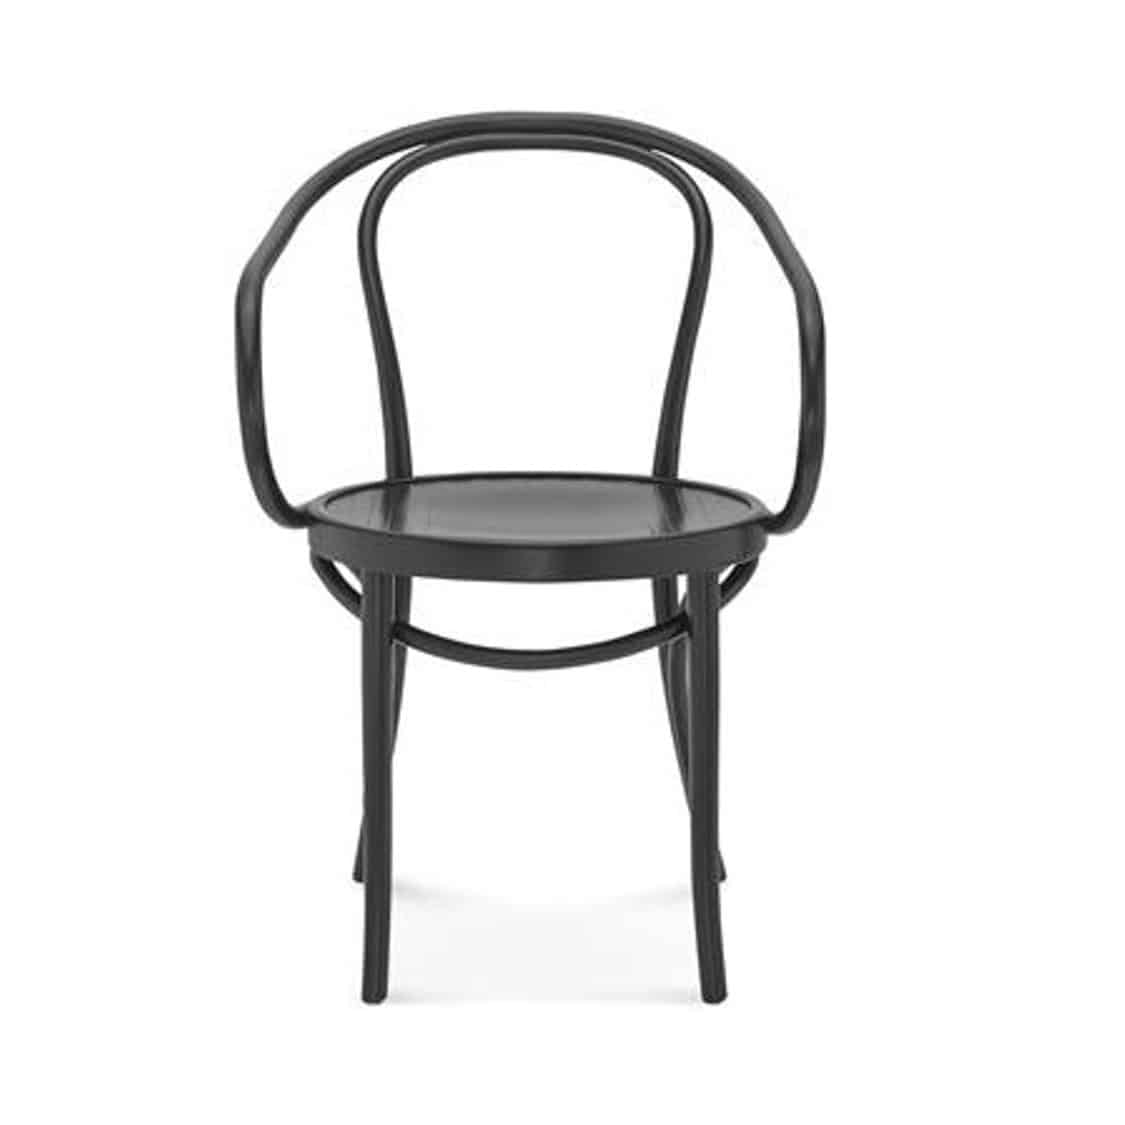 Mozart armchair b-9 classic bentwood armchair DeFrae Contract Furniture